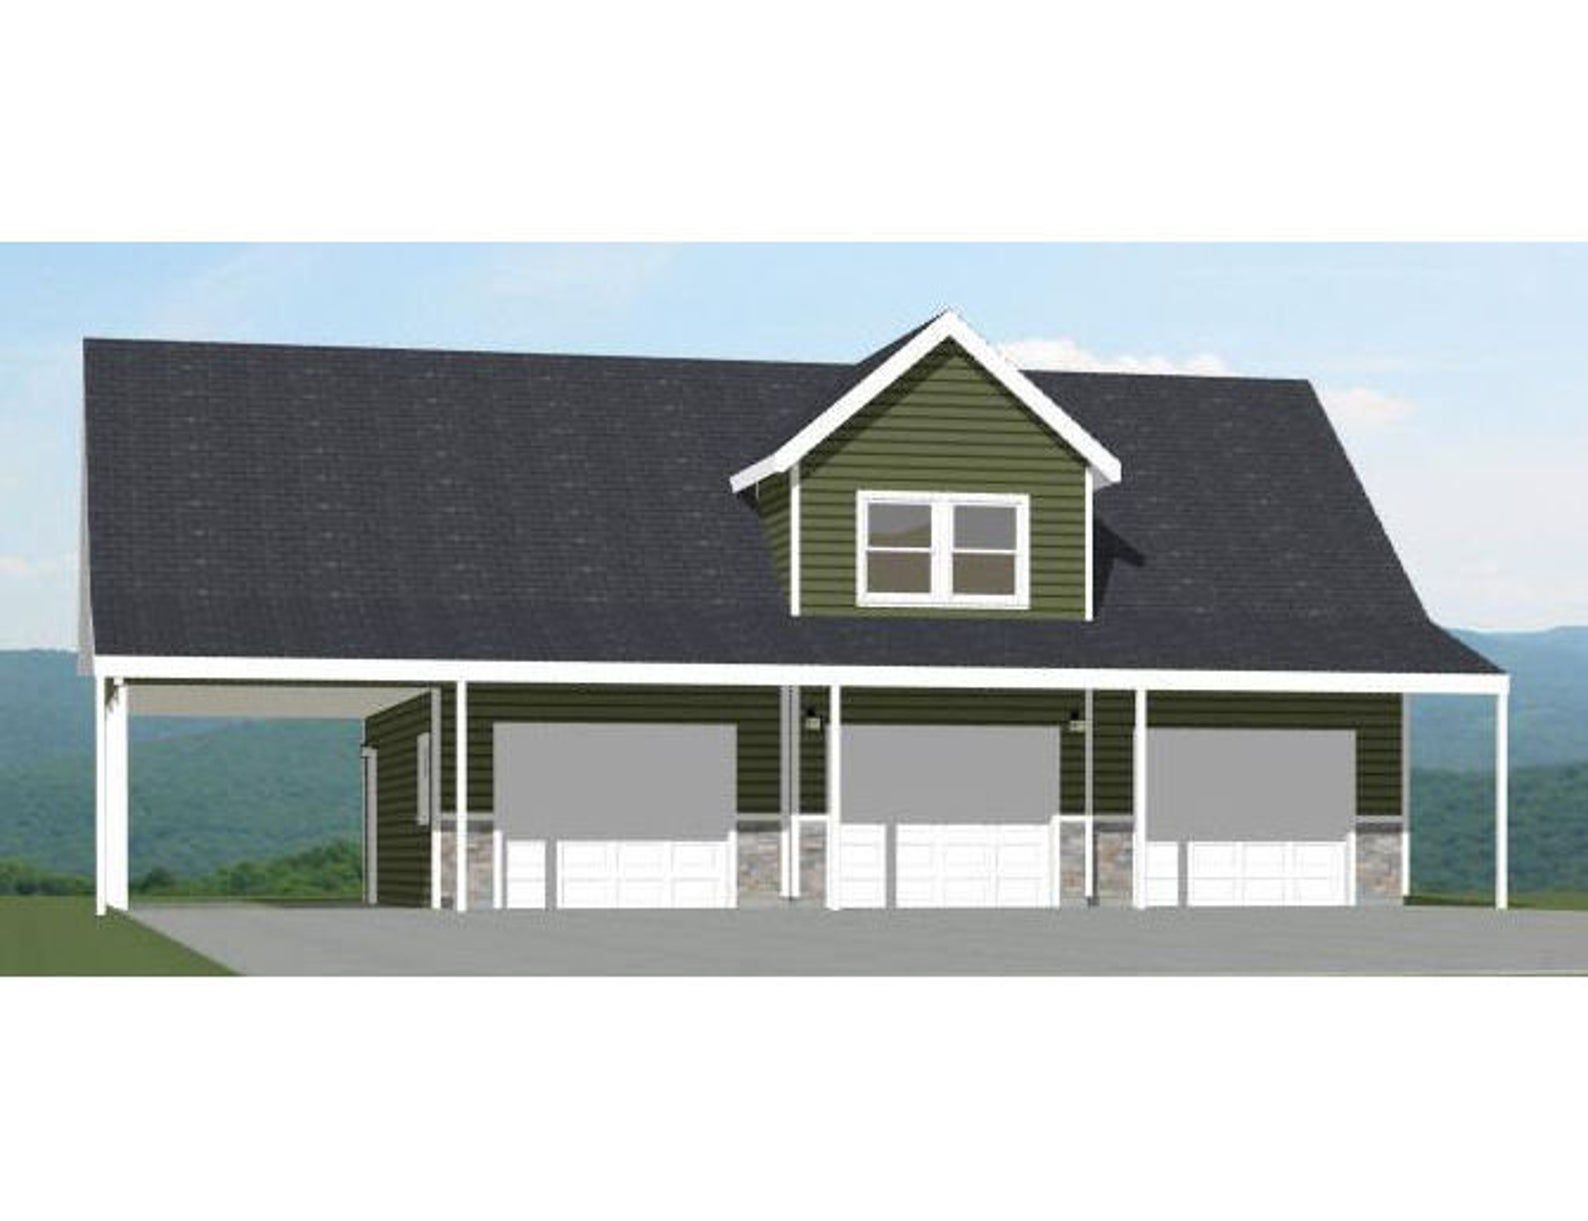 40x30 3Car Garage 2,065 sq ft PDF Floor Plan